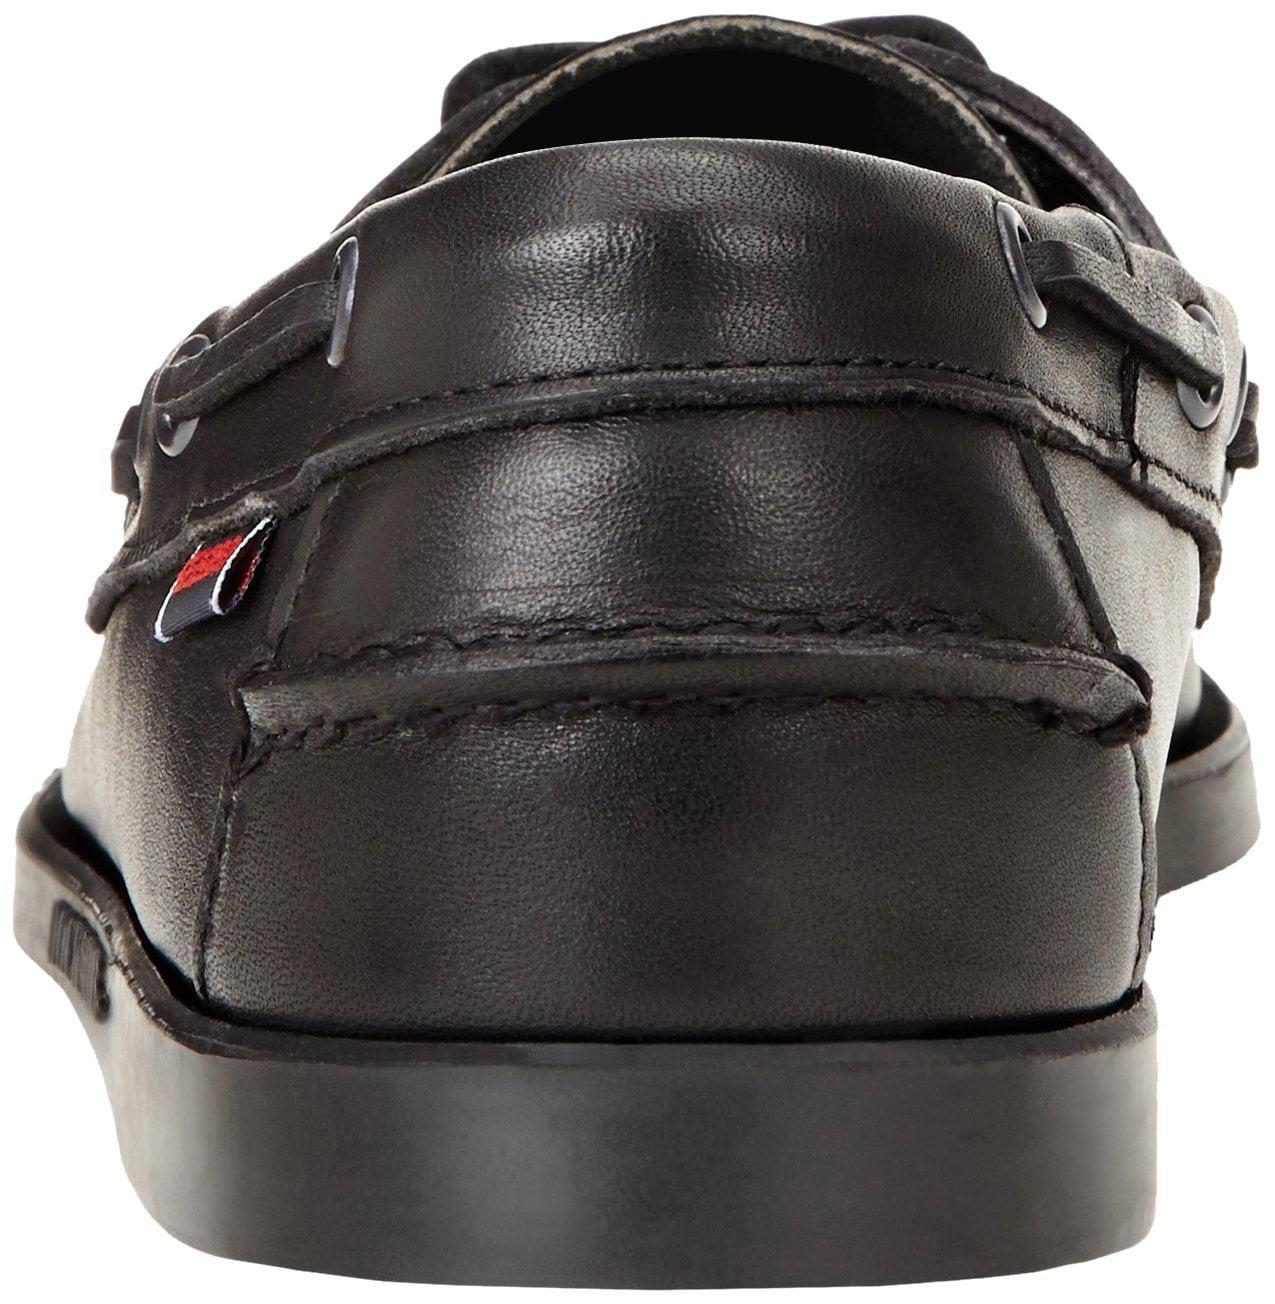 B72673 - DOCKSIDES 10 / Black_Leather / M